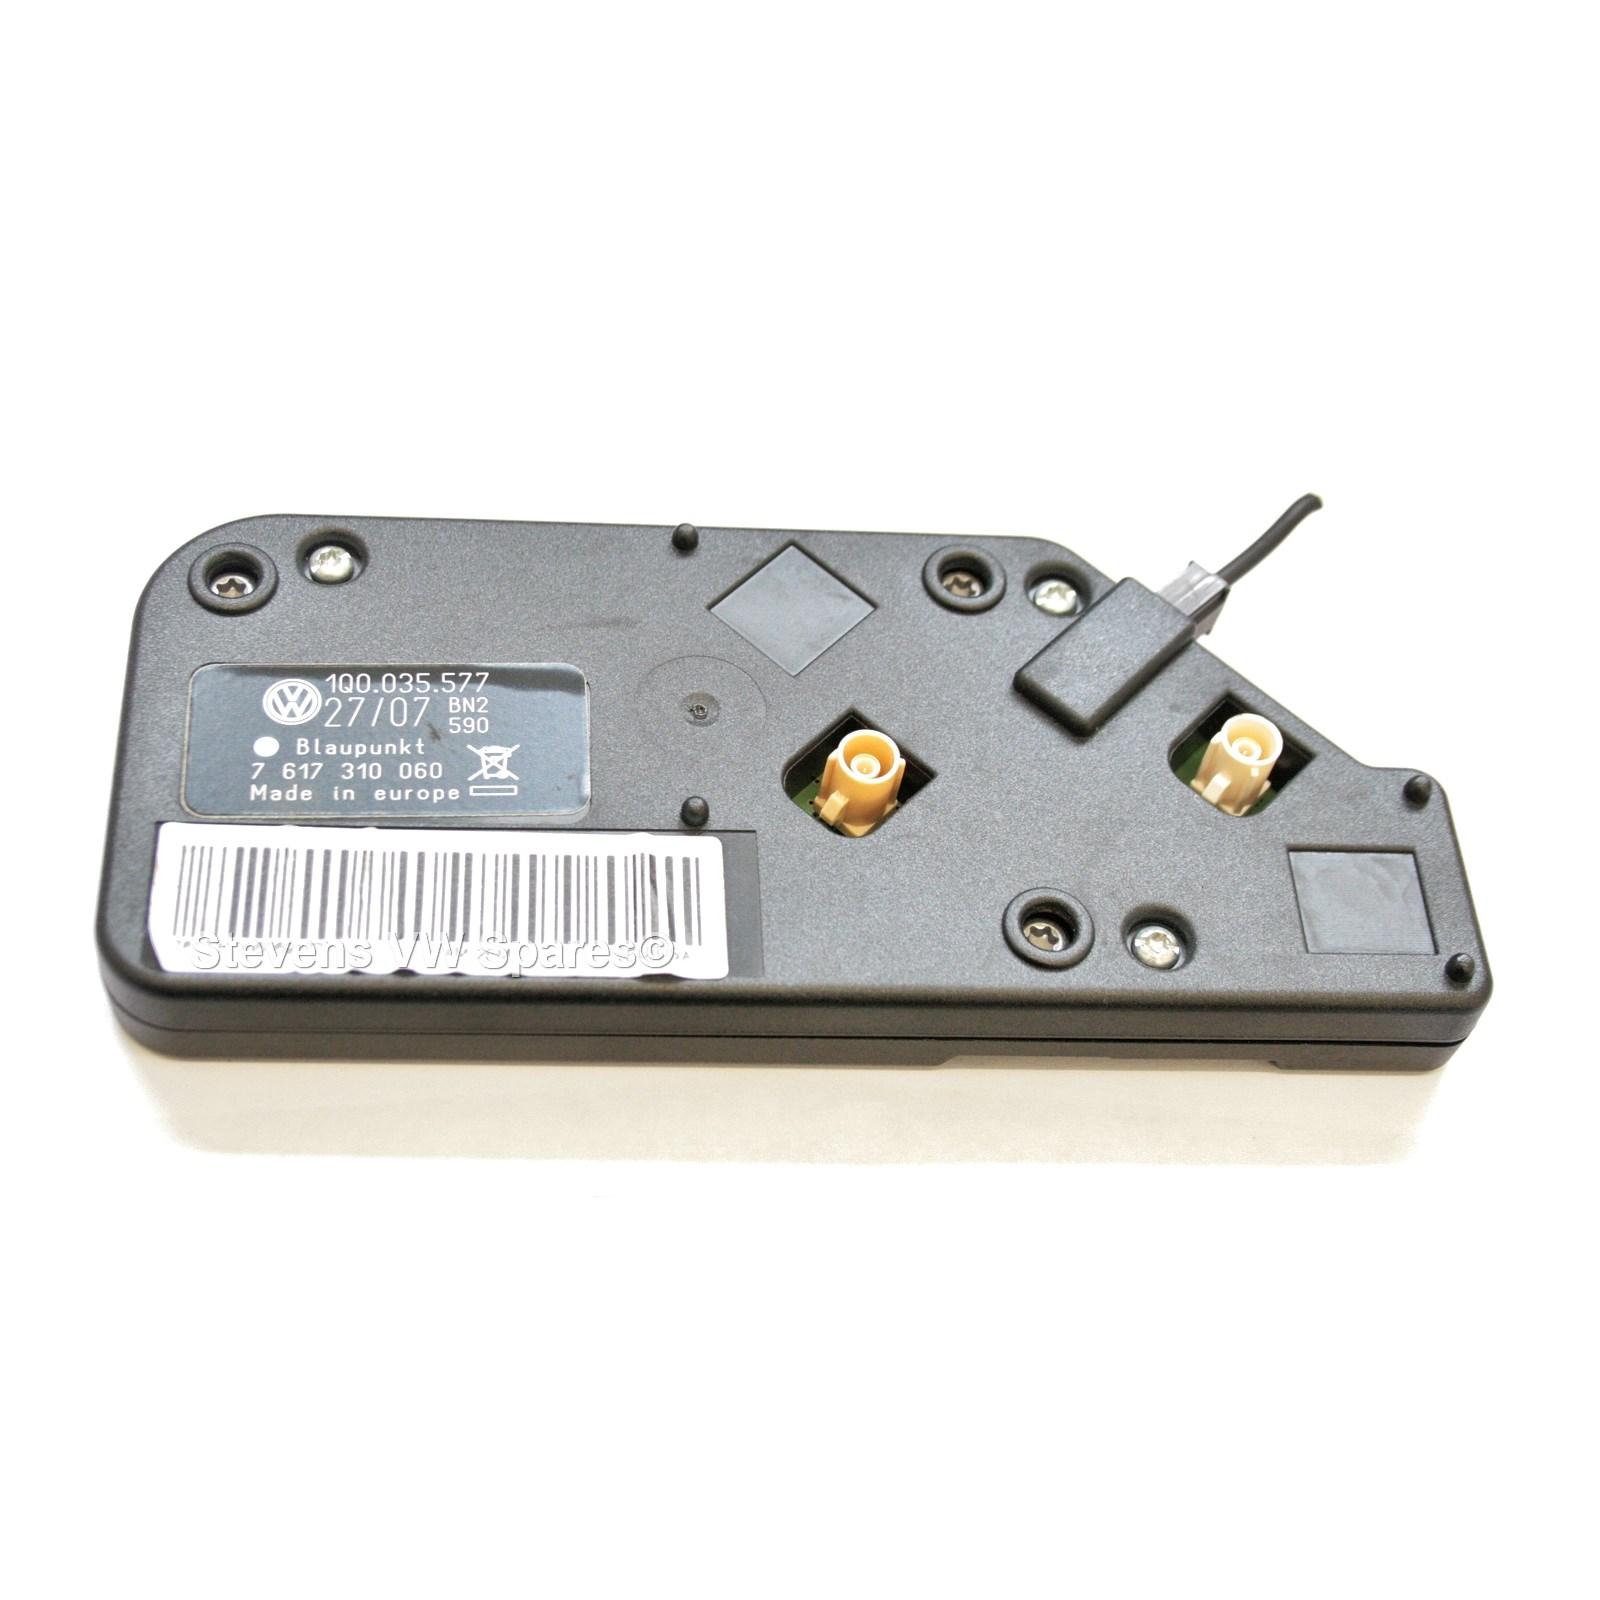 Eos Volkswagen Used: Used Genuine VW EOS Aerial Antenna Boost Amplifier